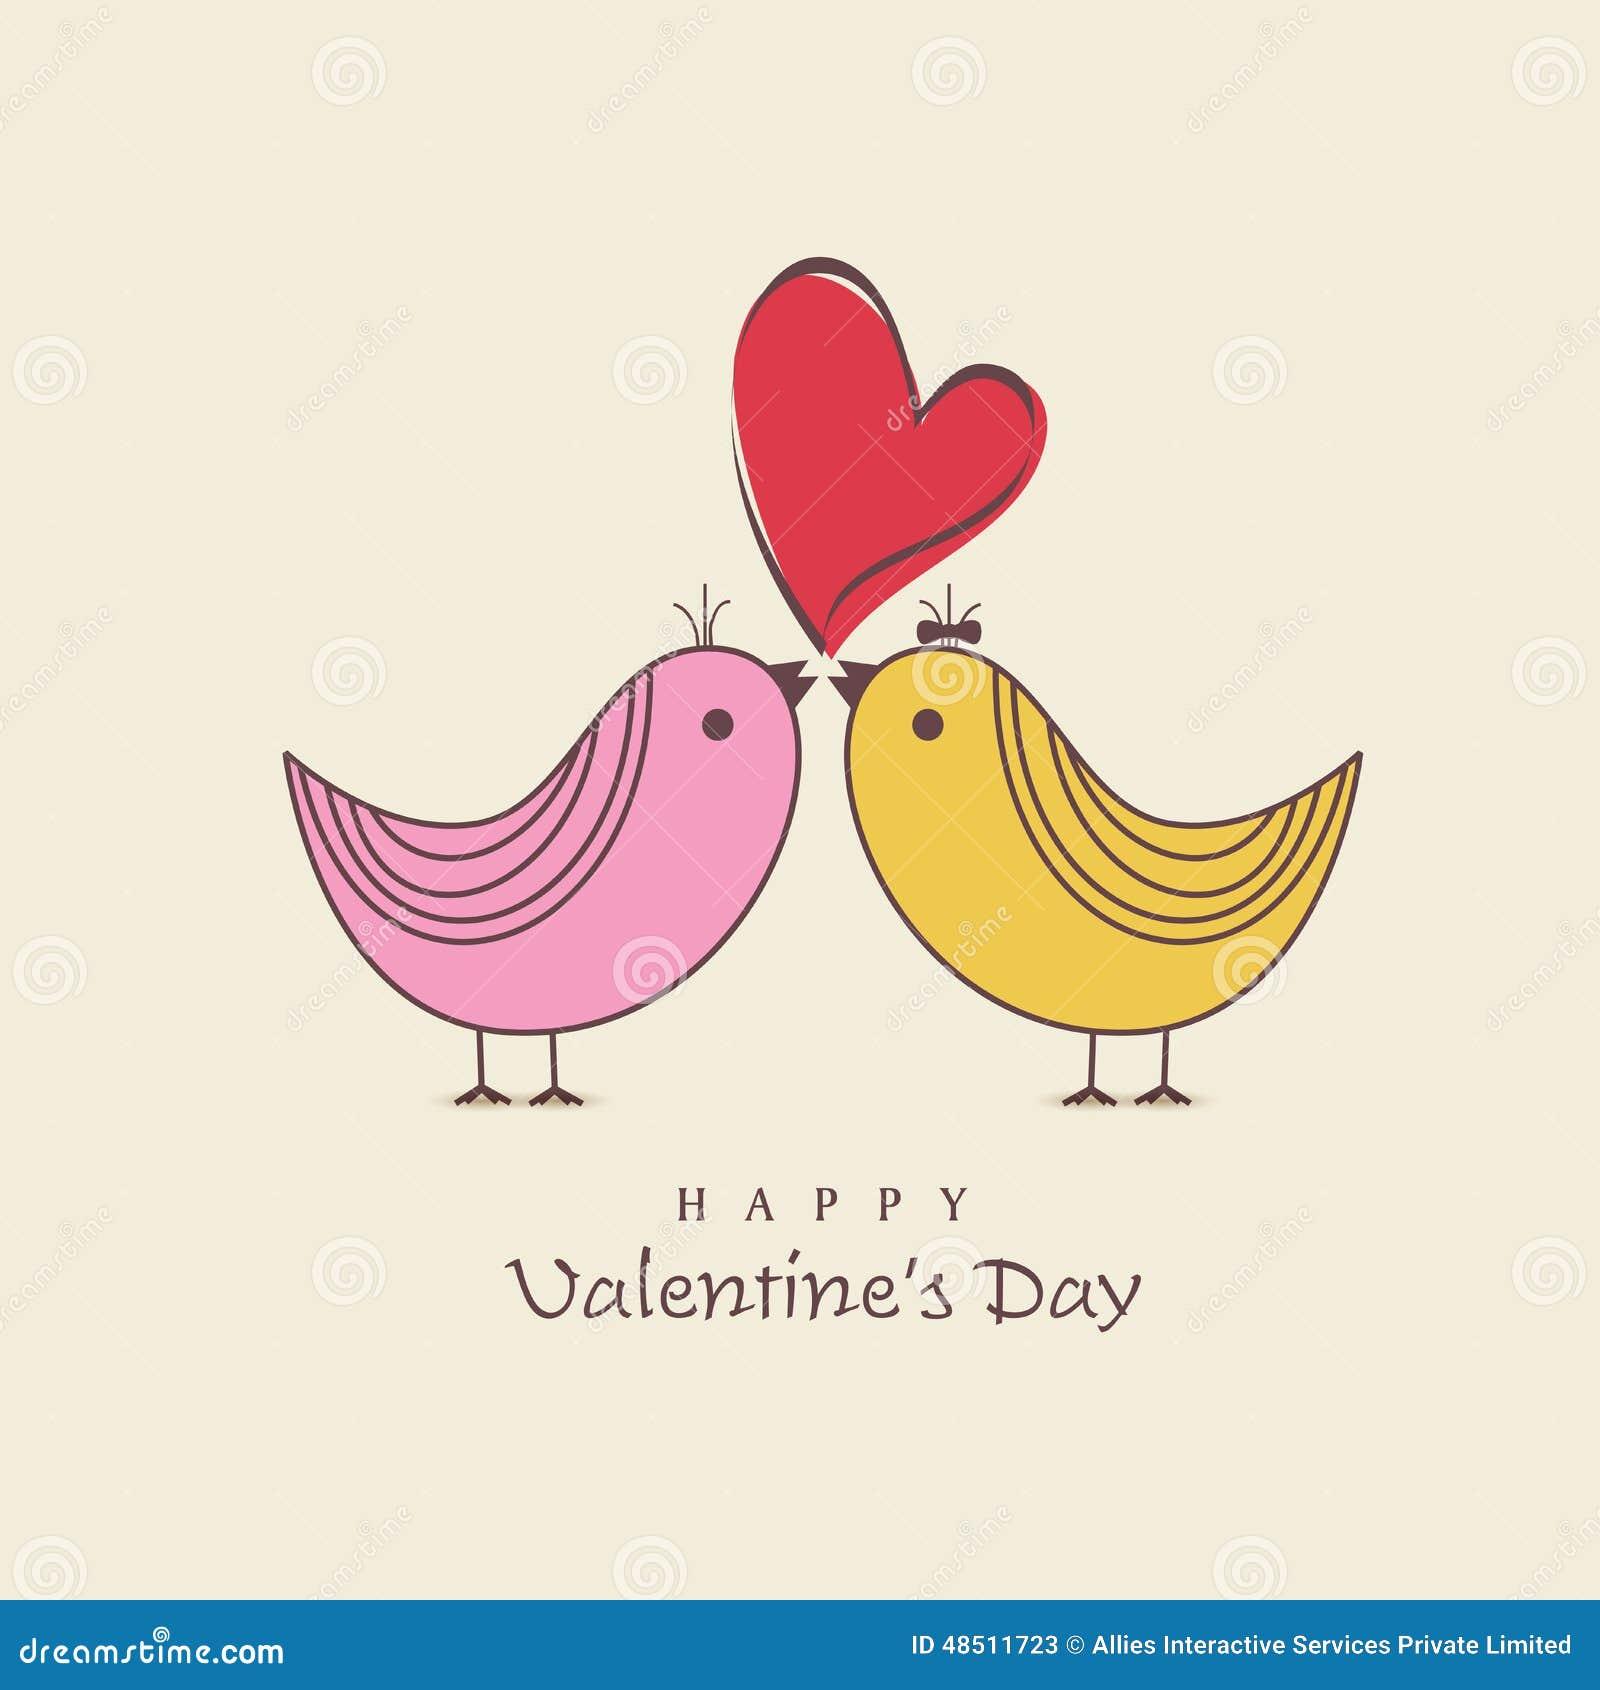 Happy Valentines Day Celebration With Cute Love Bird Stock Illustration